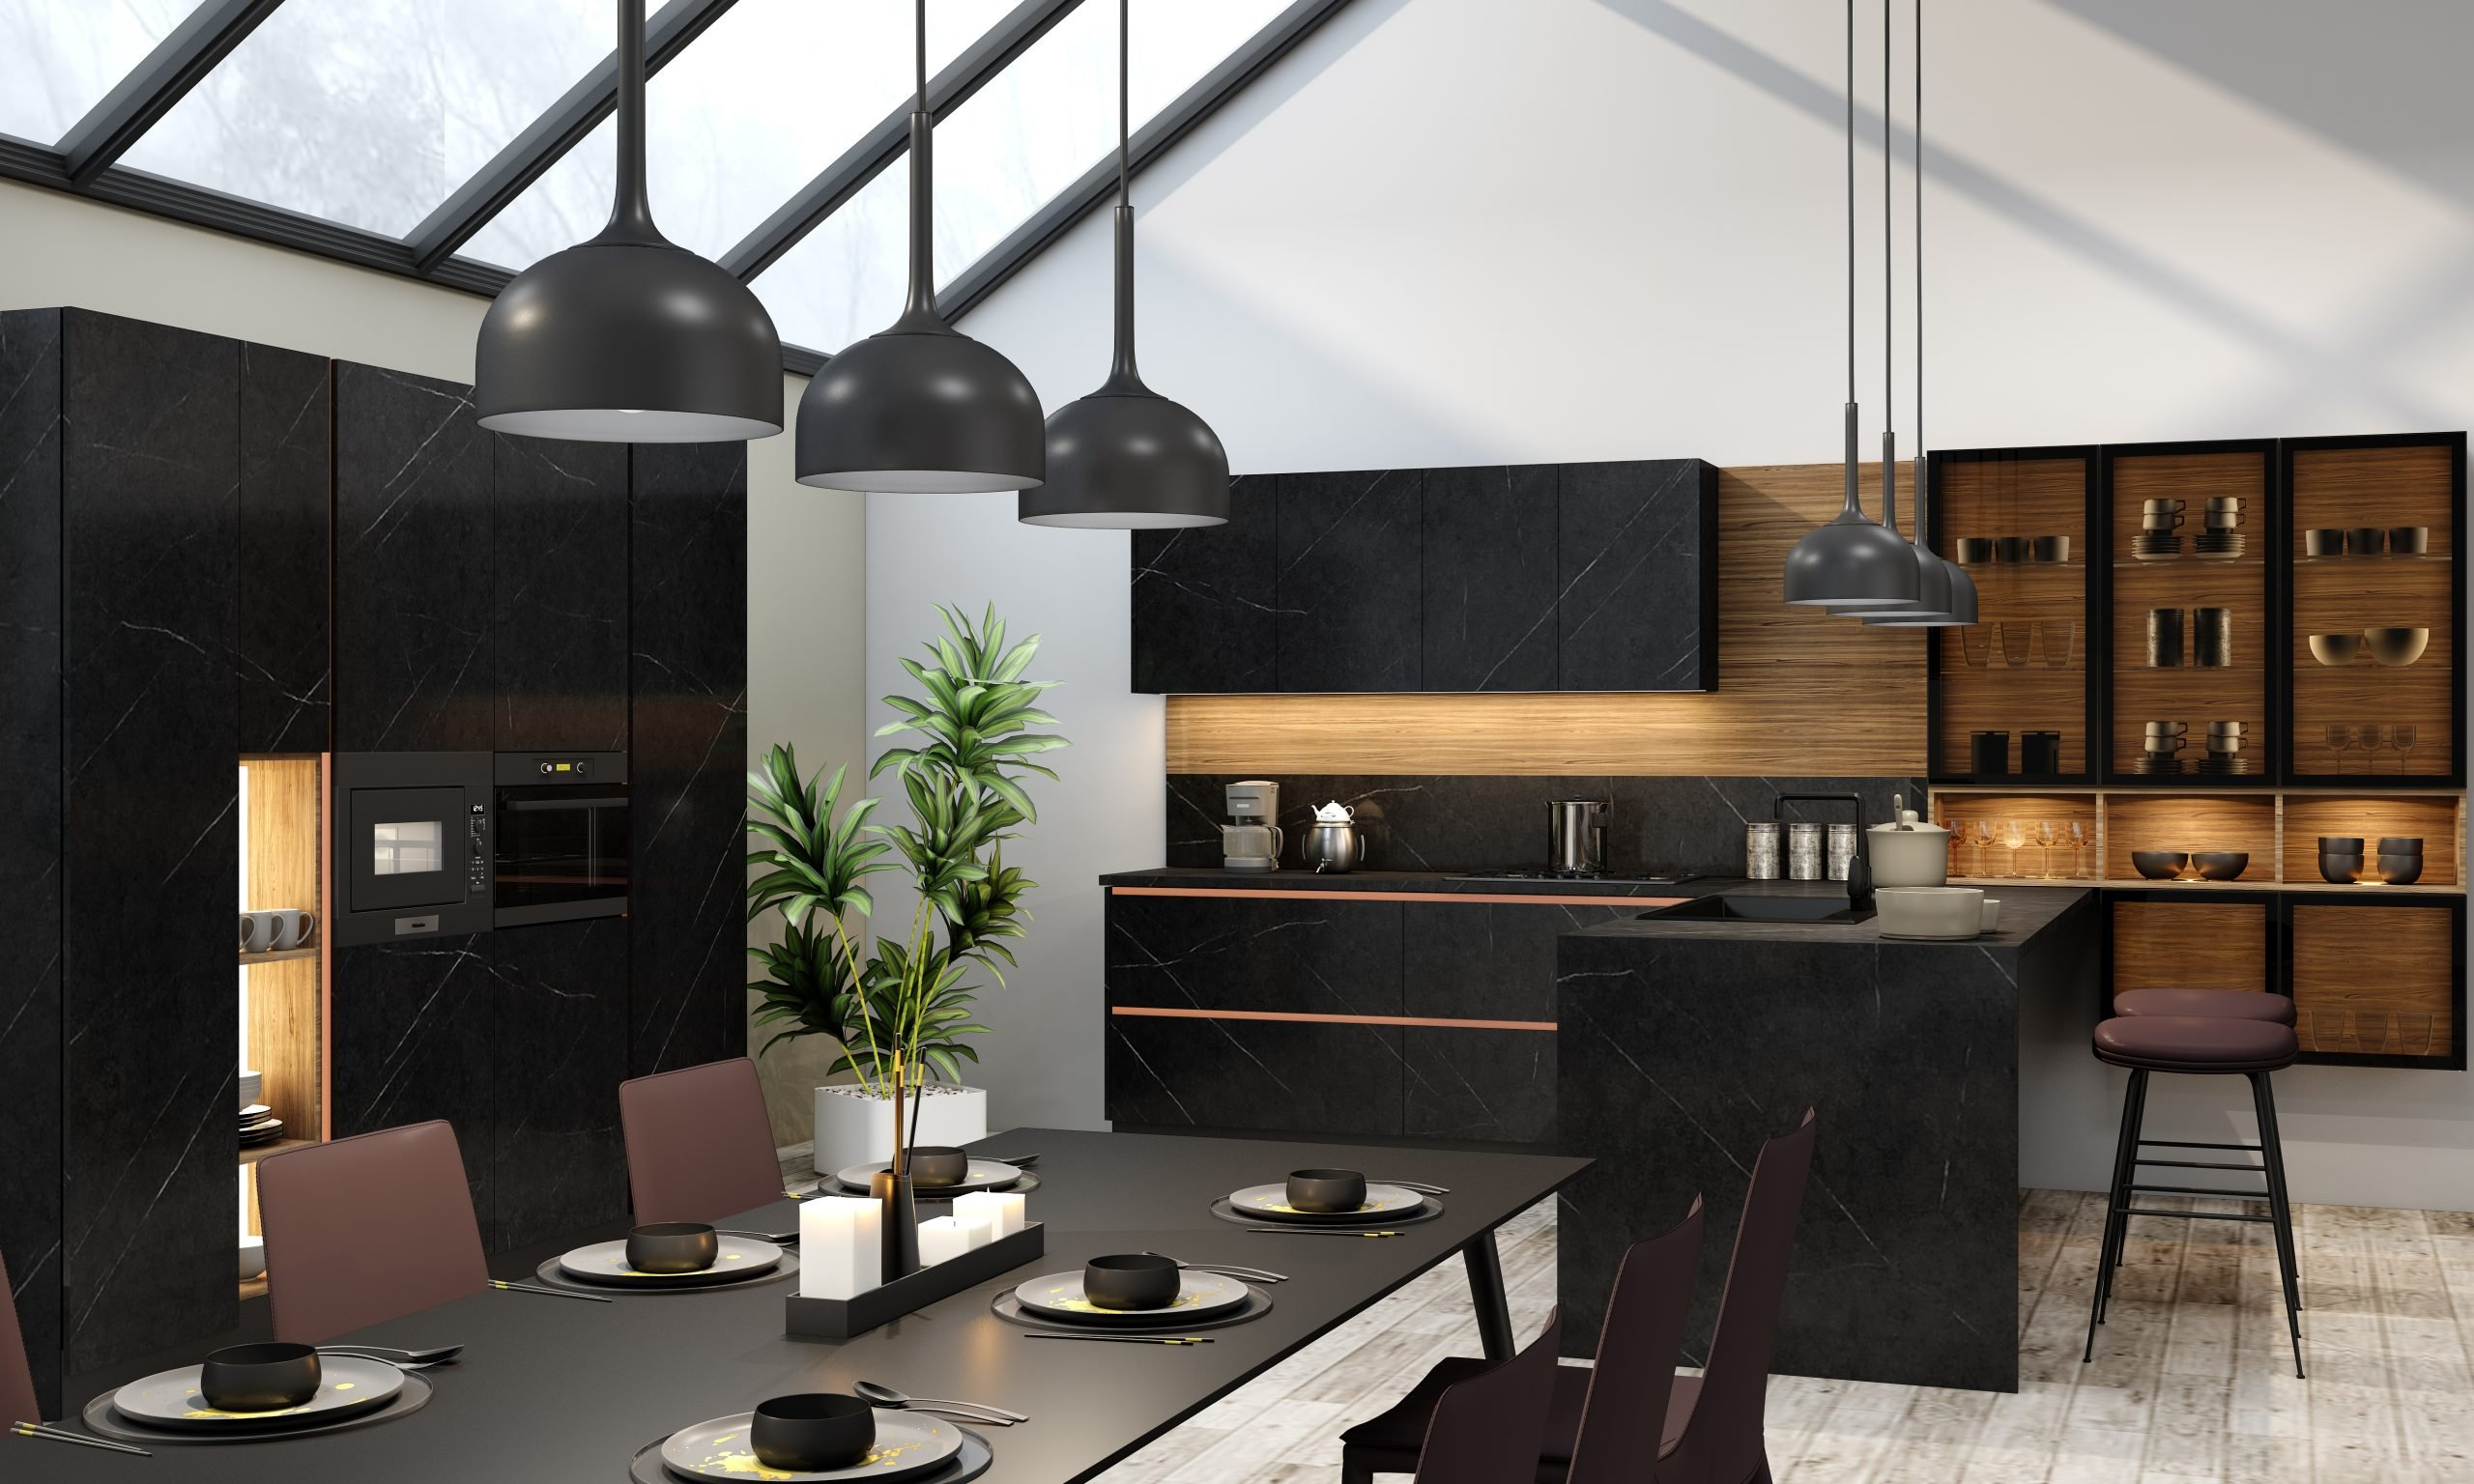 Premiumline Modern Kitchen With Gold Handleless Profile in Levanto Black Stone Finish